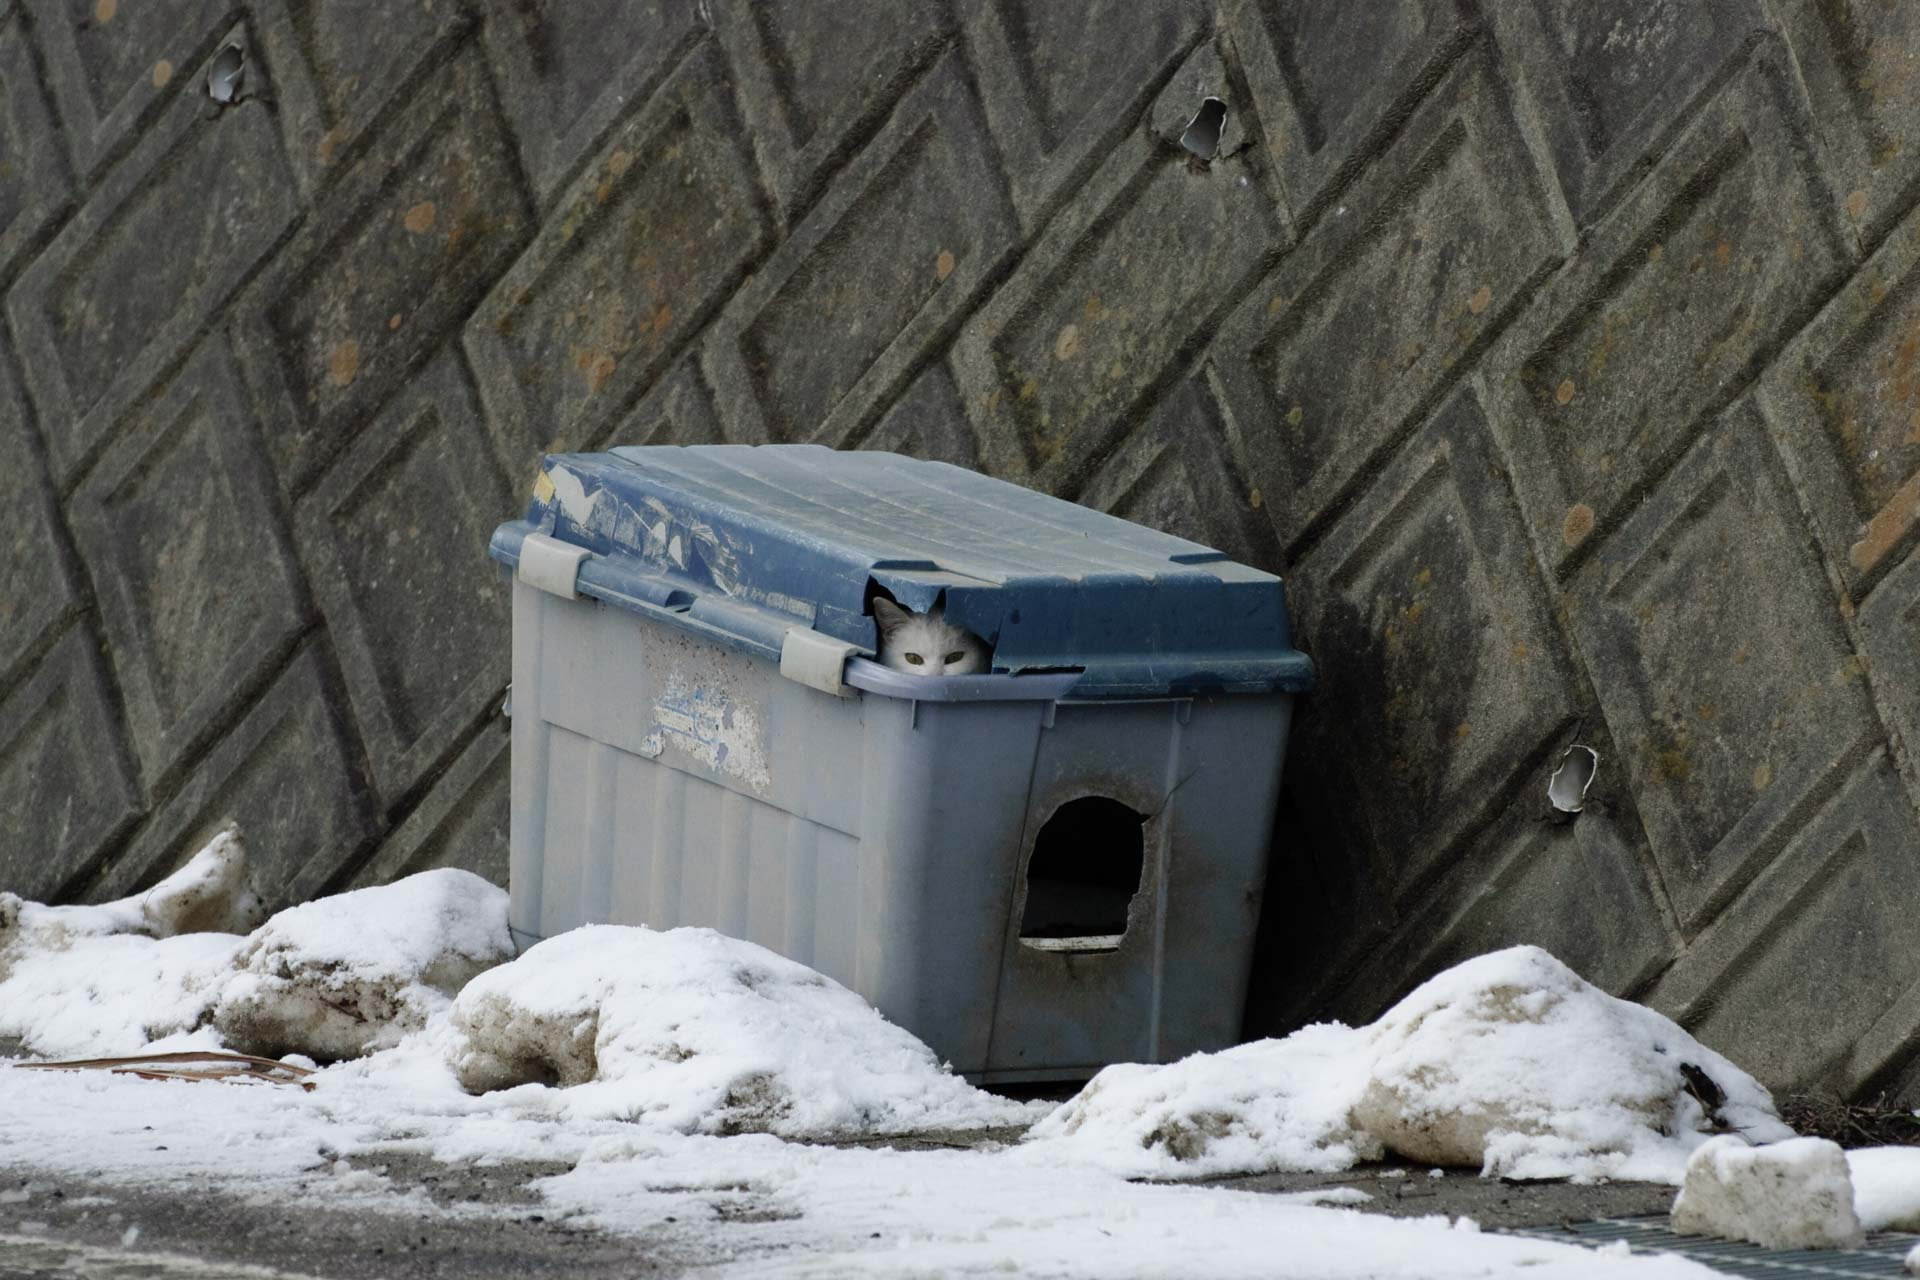 Cat in feeding box